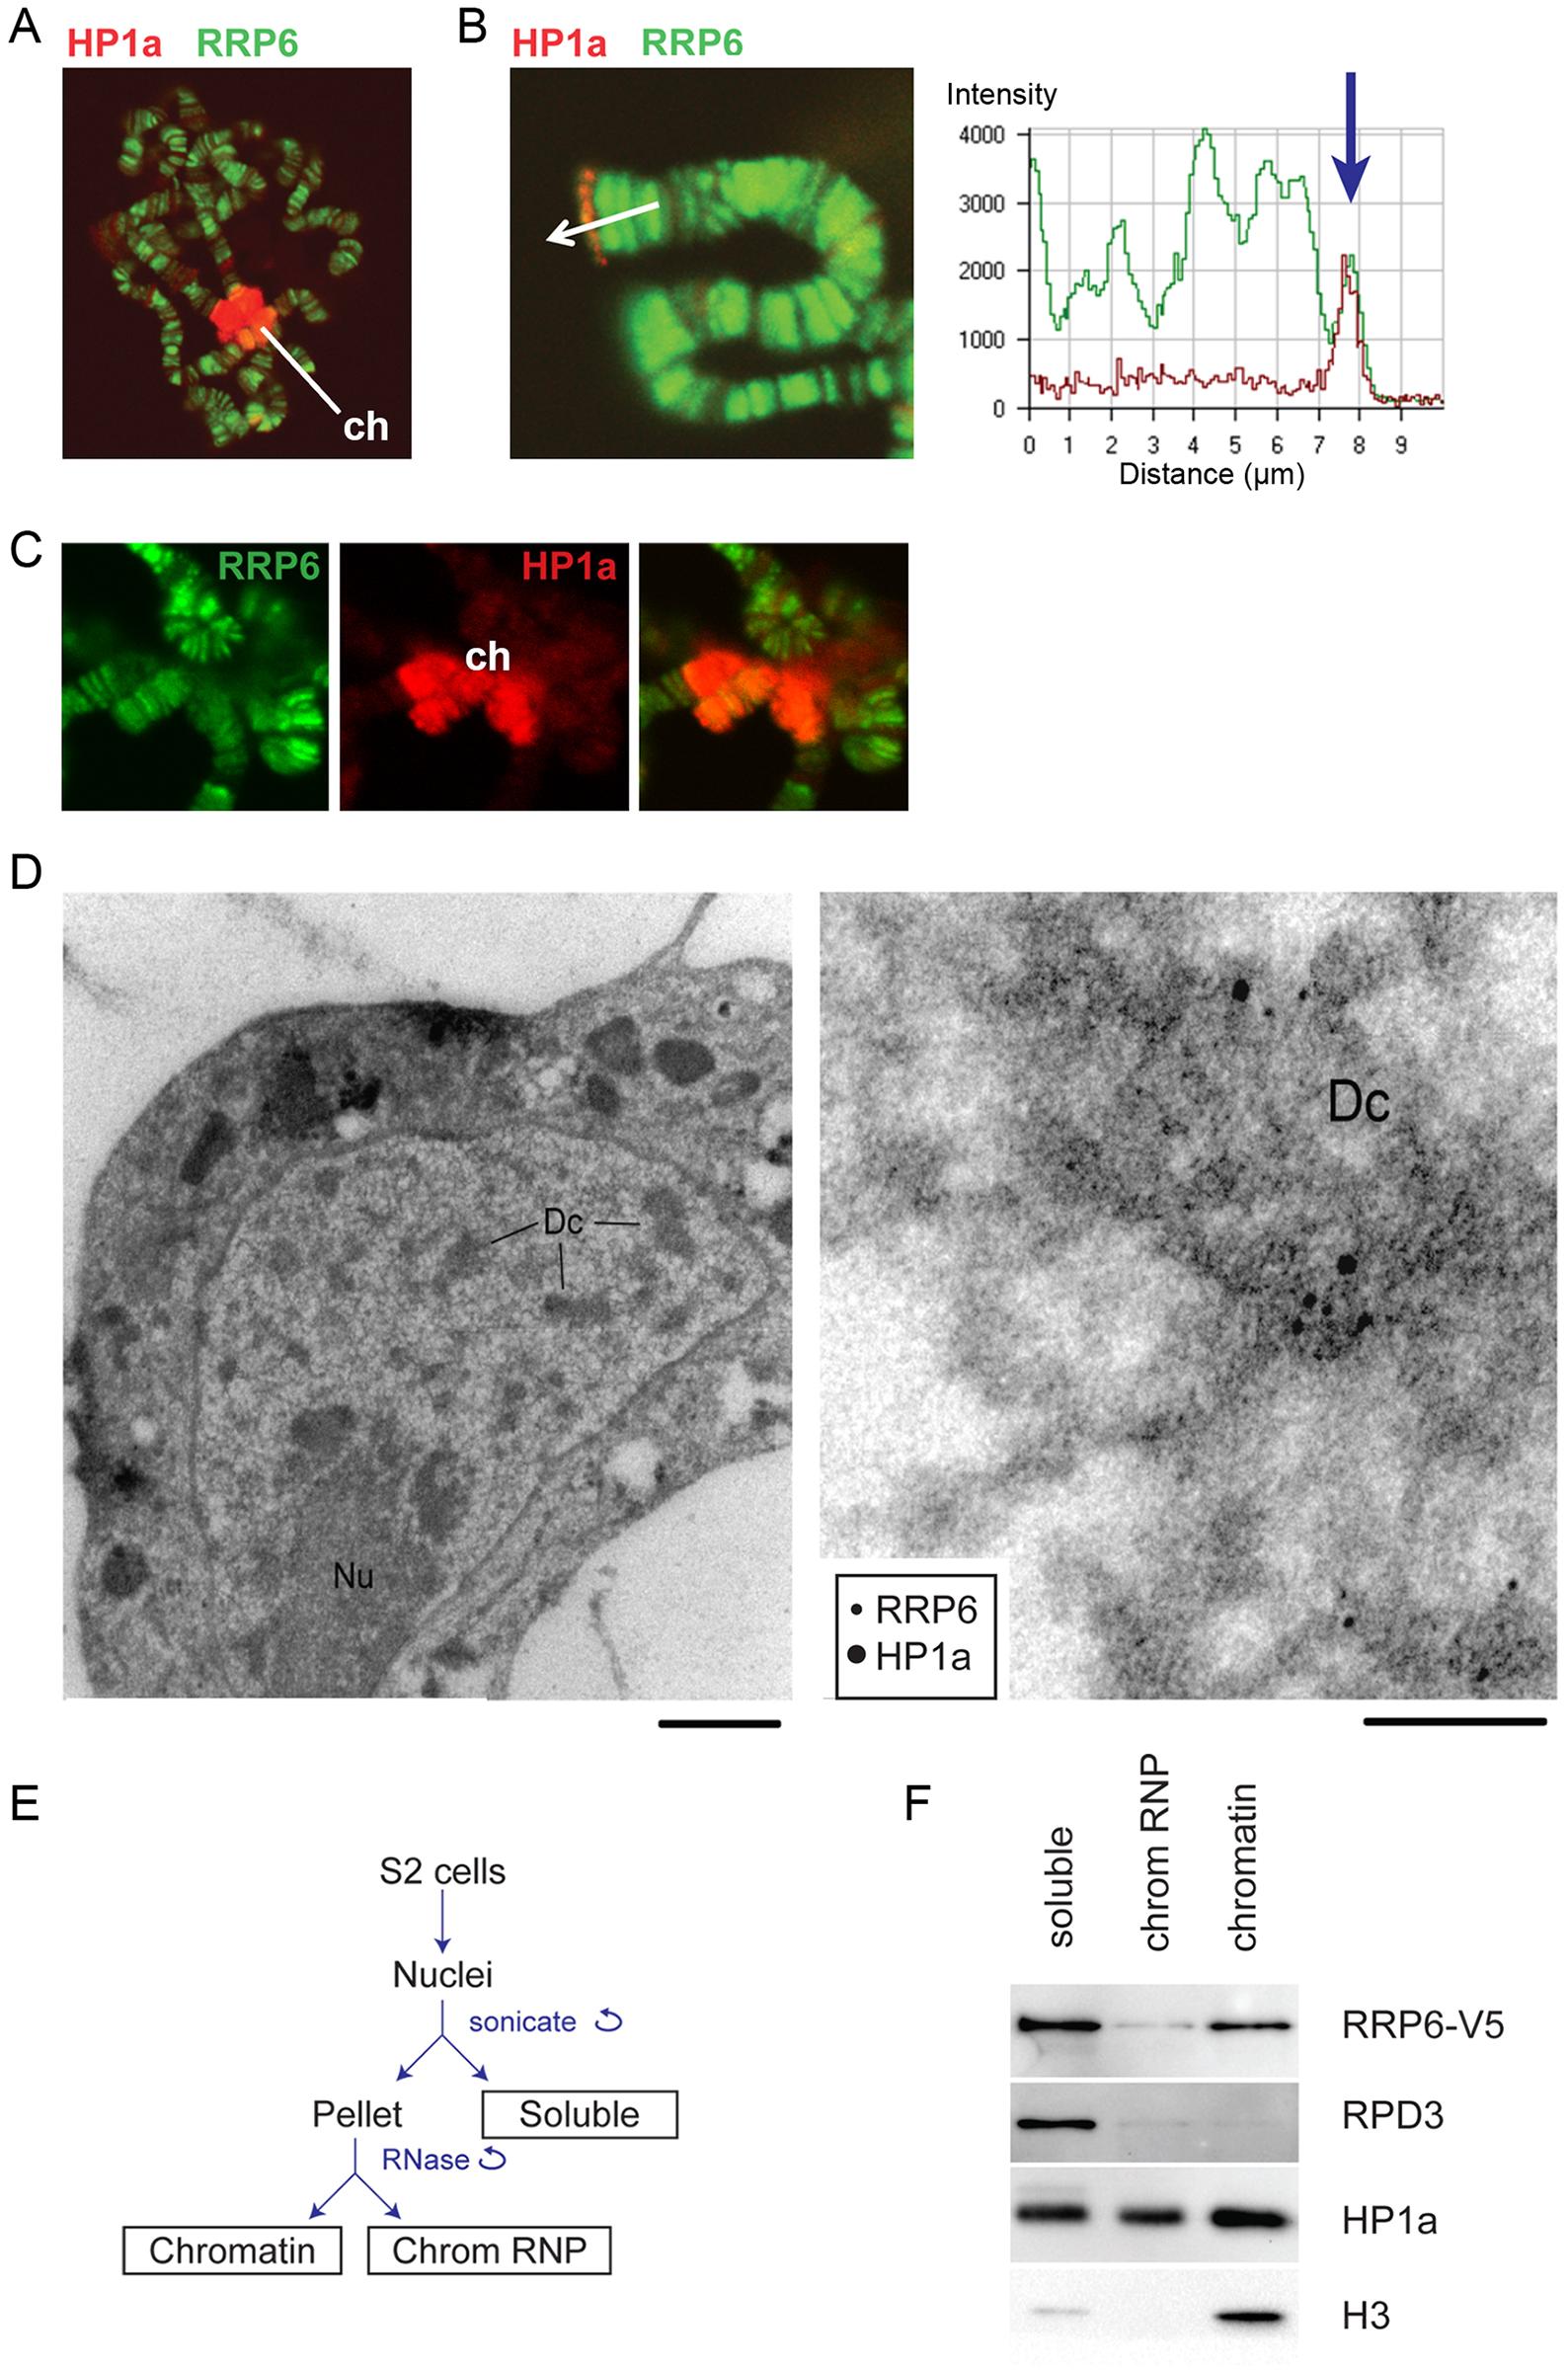 RRP6 is associated with heterochromatin <i>in vivo</i>.